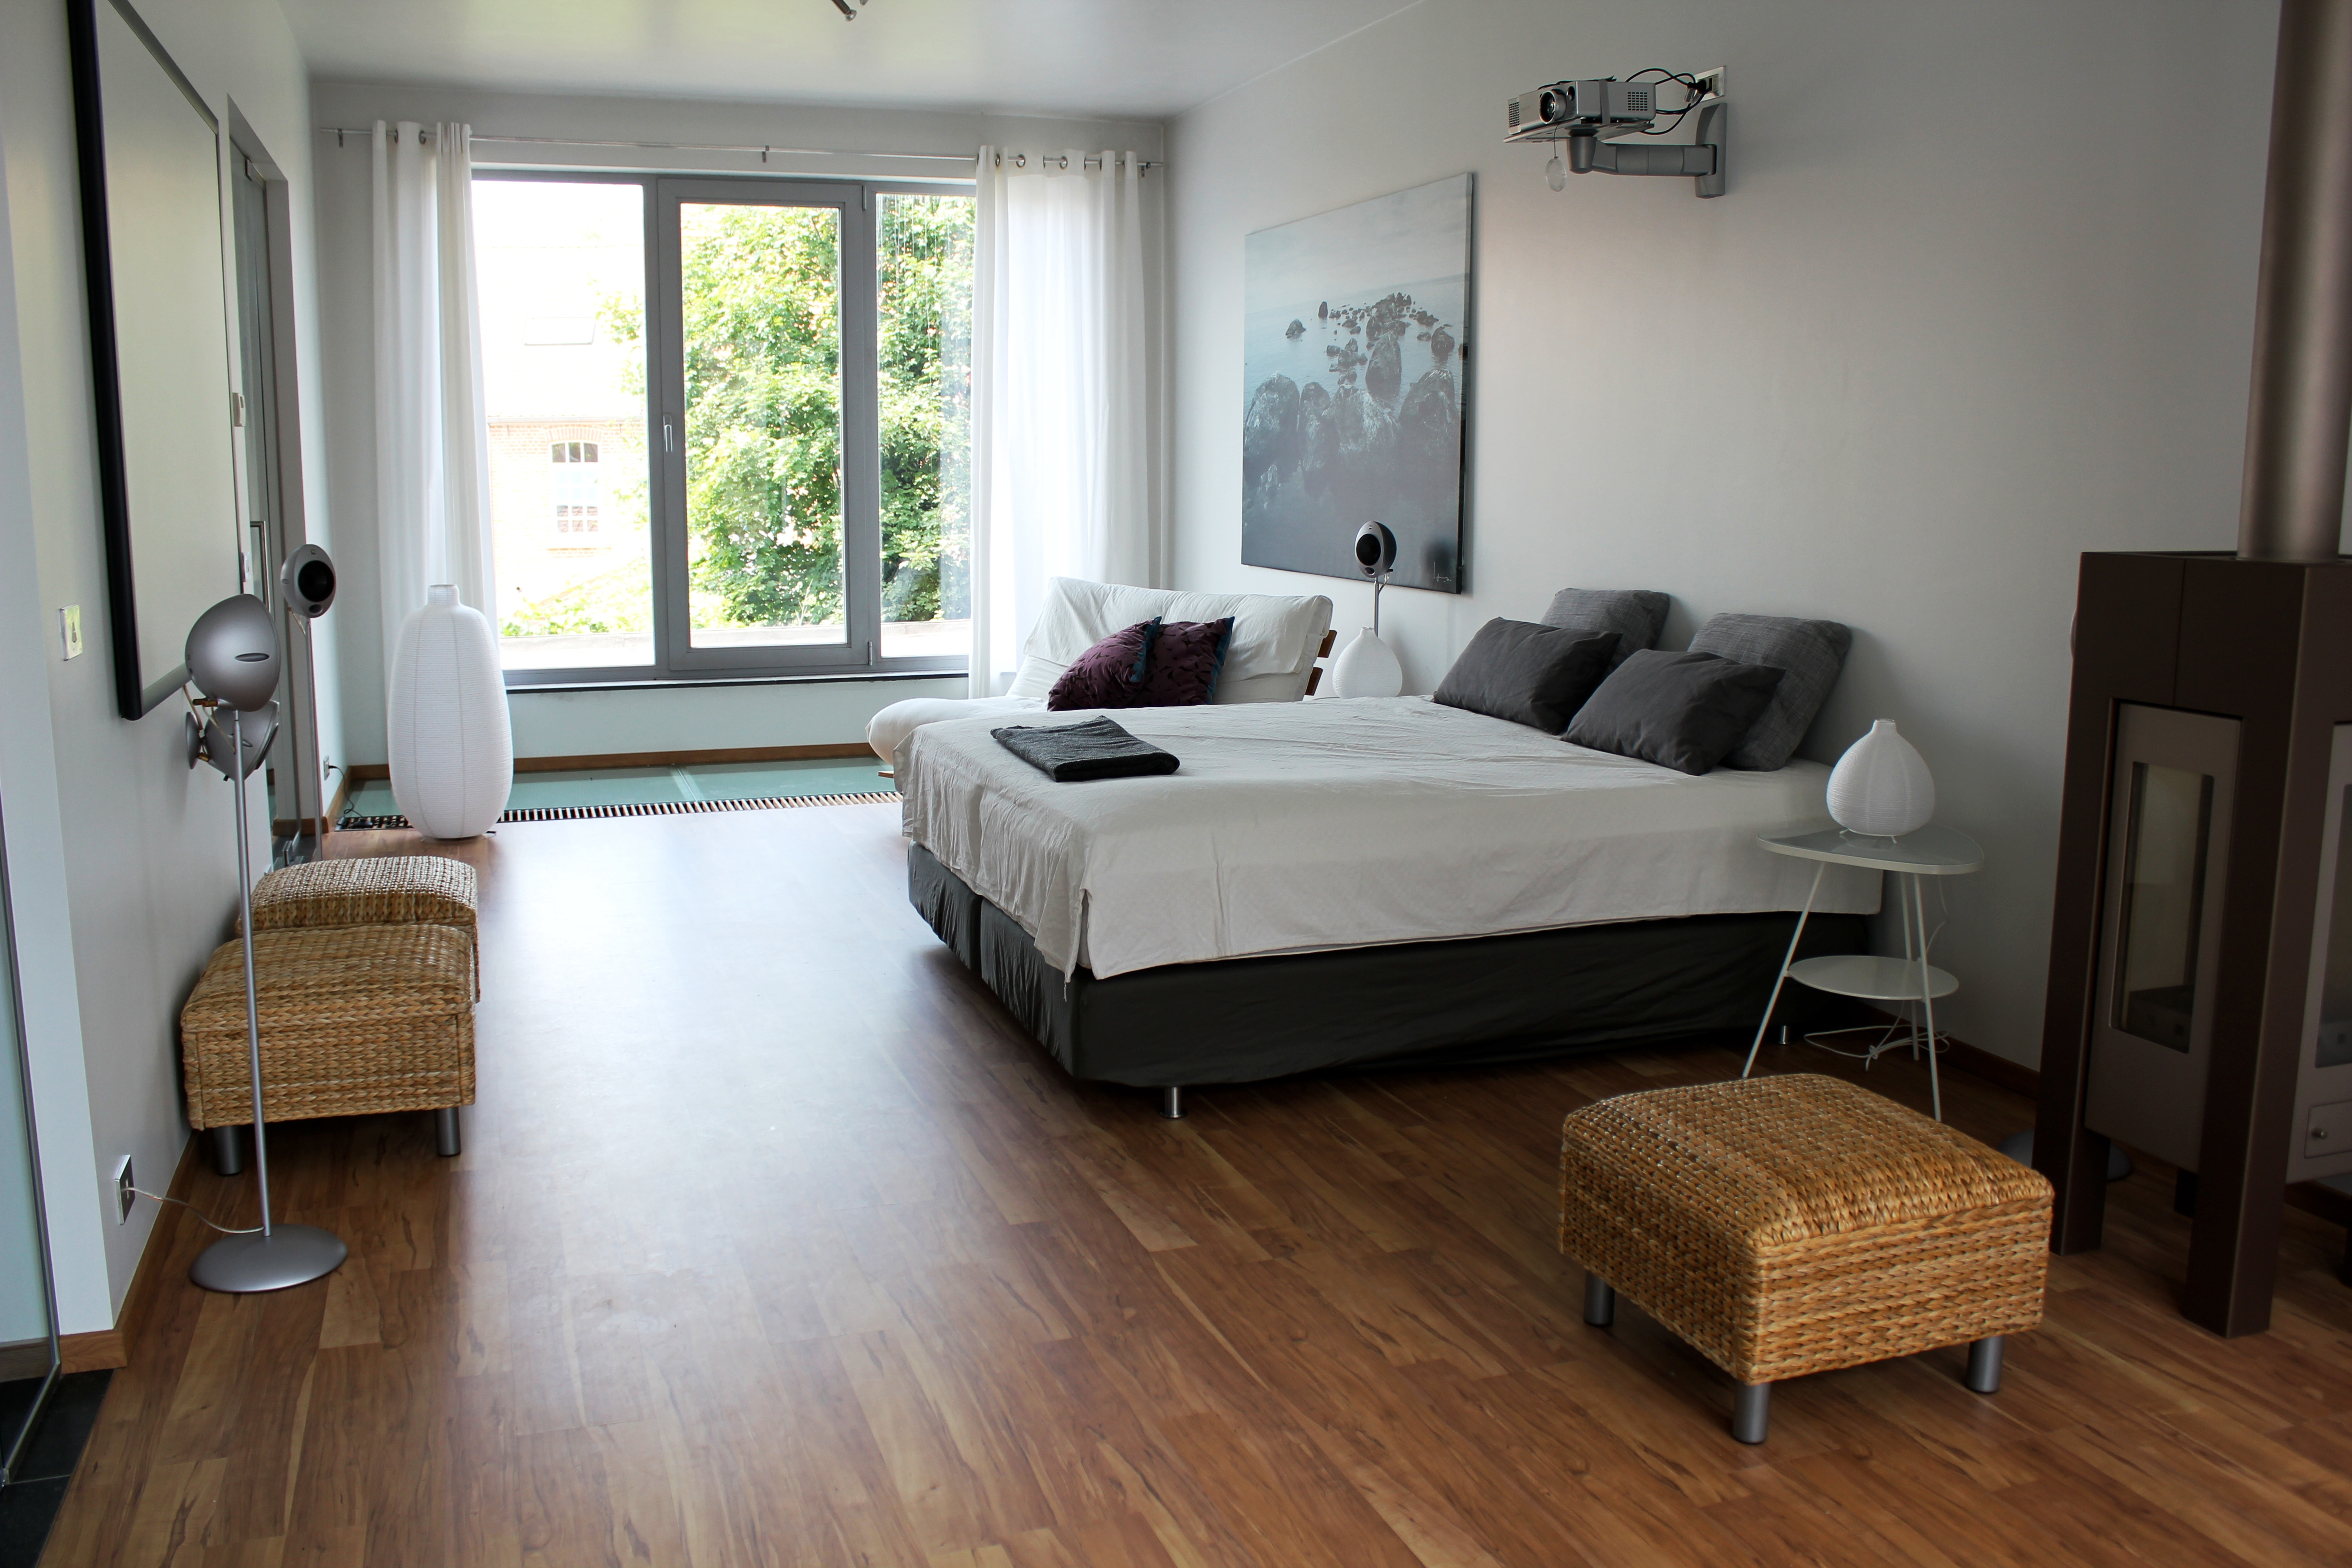 Kamer inblauw - Kleur kamer volwassen foto ...